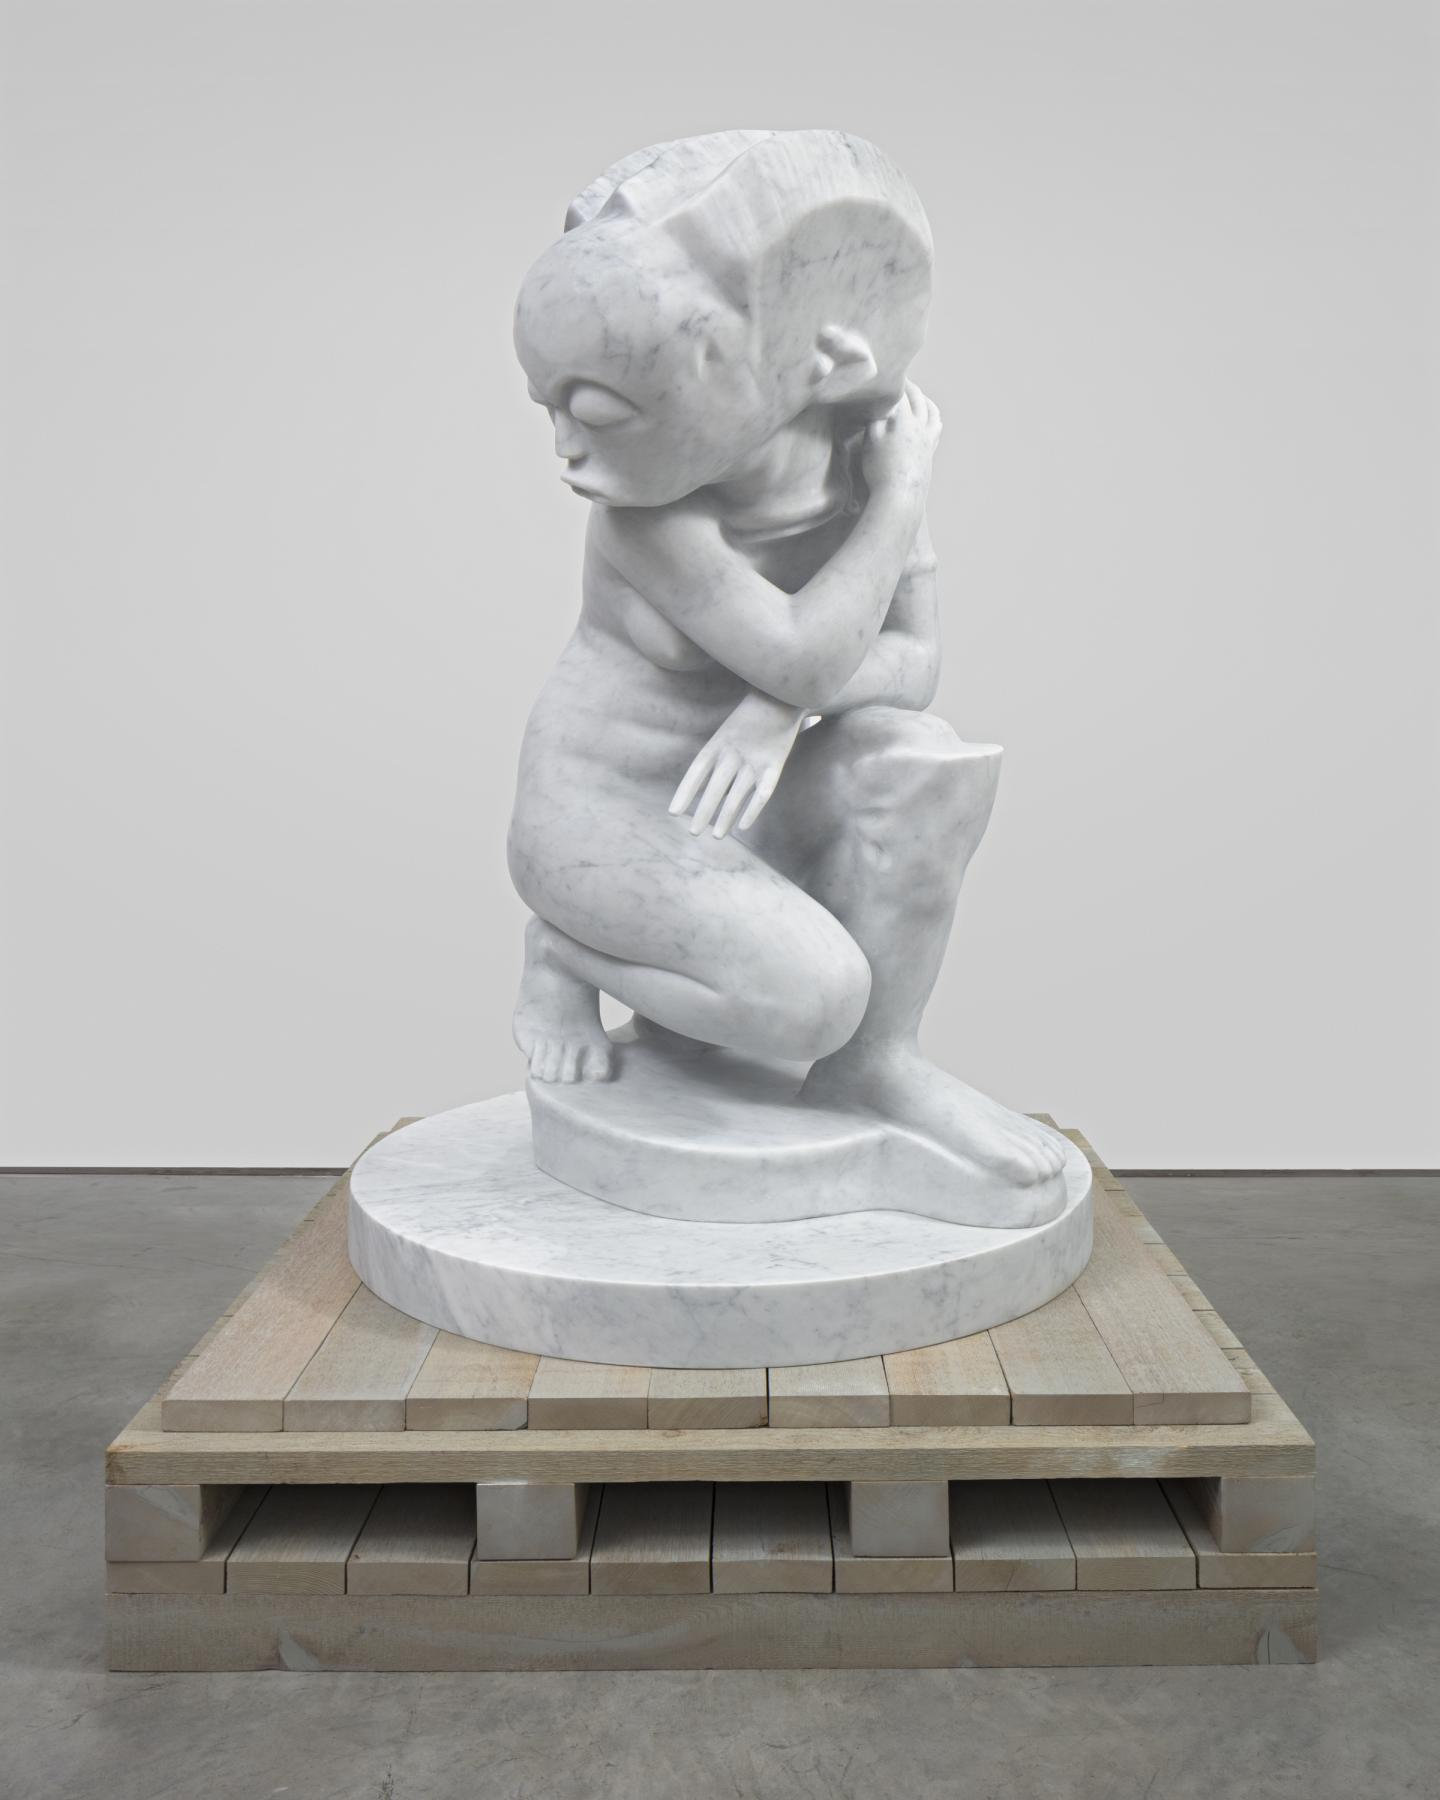 MARIANNE BOESKY GALLERY BOESKYGALLERY.COM 212.680.9889 347.296.3667 TELEPHONE FAX NEW YORK | ASPEN Sanford Biggers Lady Interbellum , 2020 White marble on custom cedar plinth Marble, 157.5 x 114.3 x 104.1 c